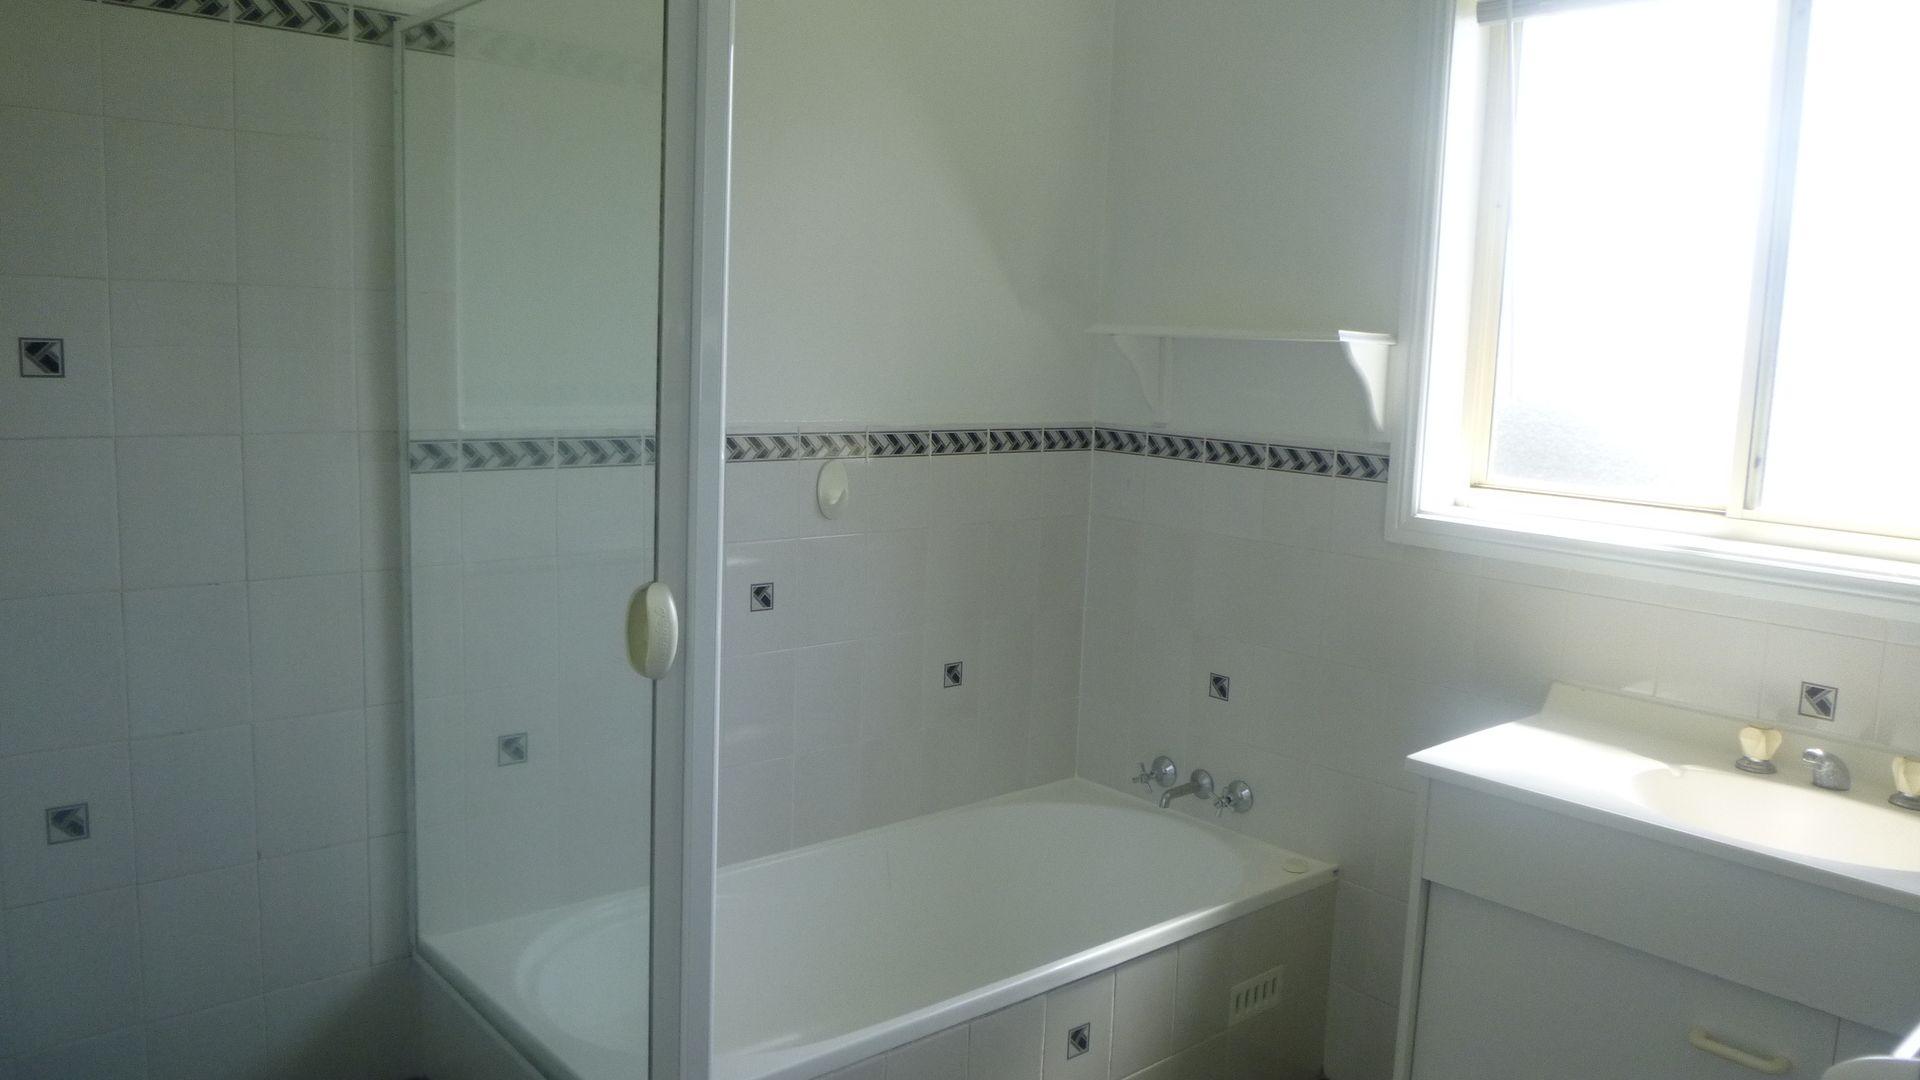 219A Lambton Rd, New Lambton NSW 2305, Image 1